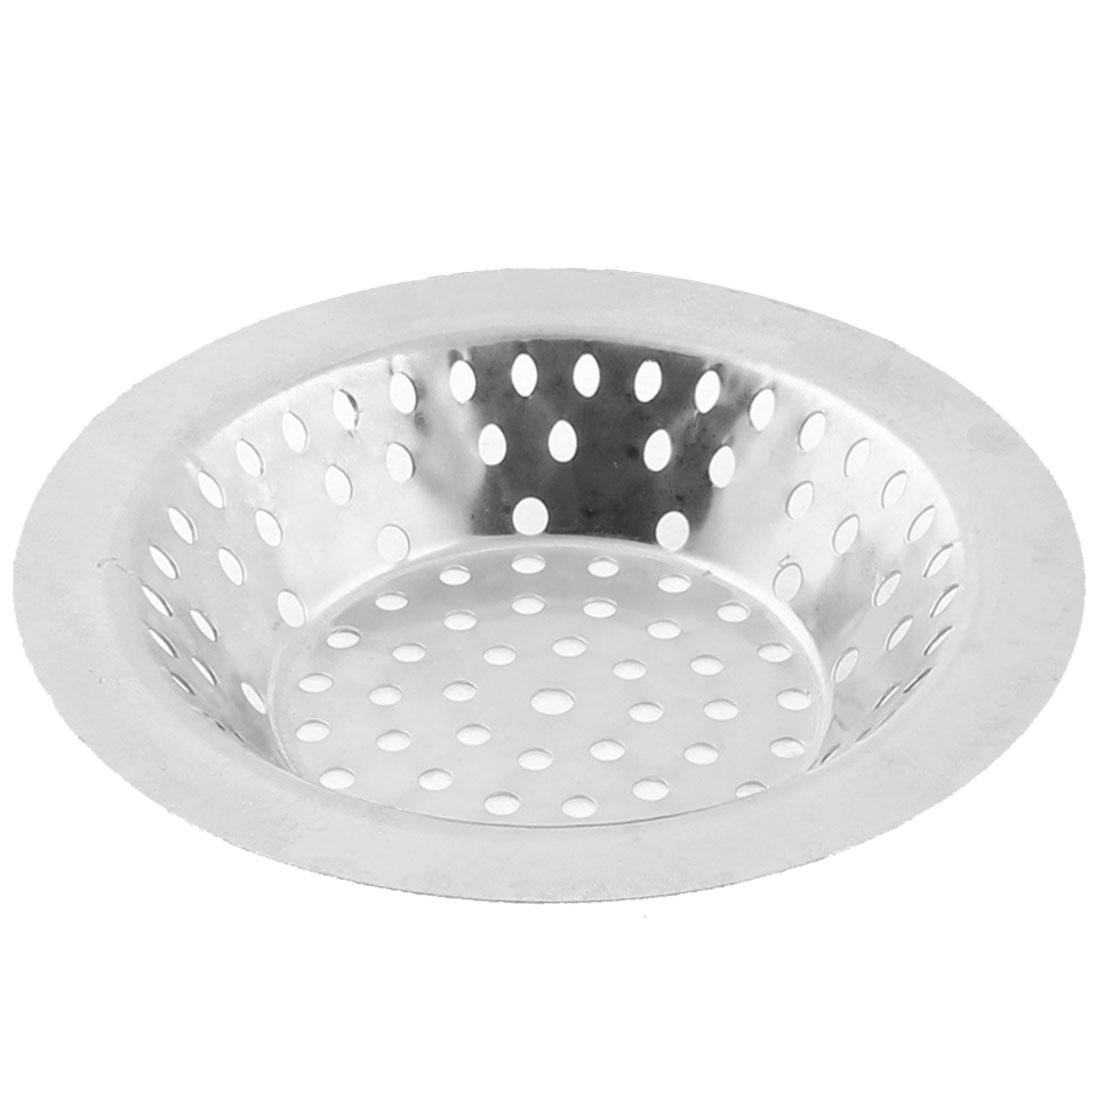 10.6cm Dia Home Kitchen Sink Basin Drain Waste Filter Strainer Basket Silver Tone